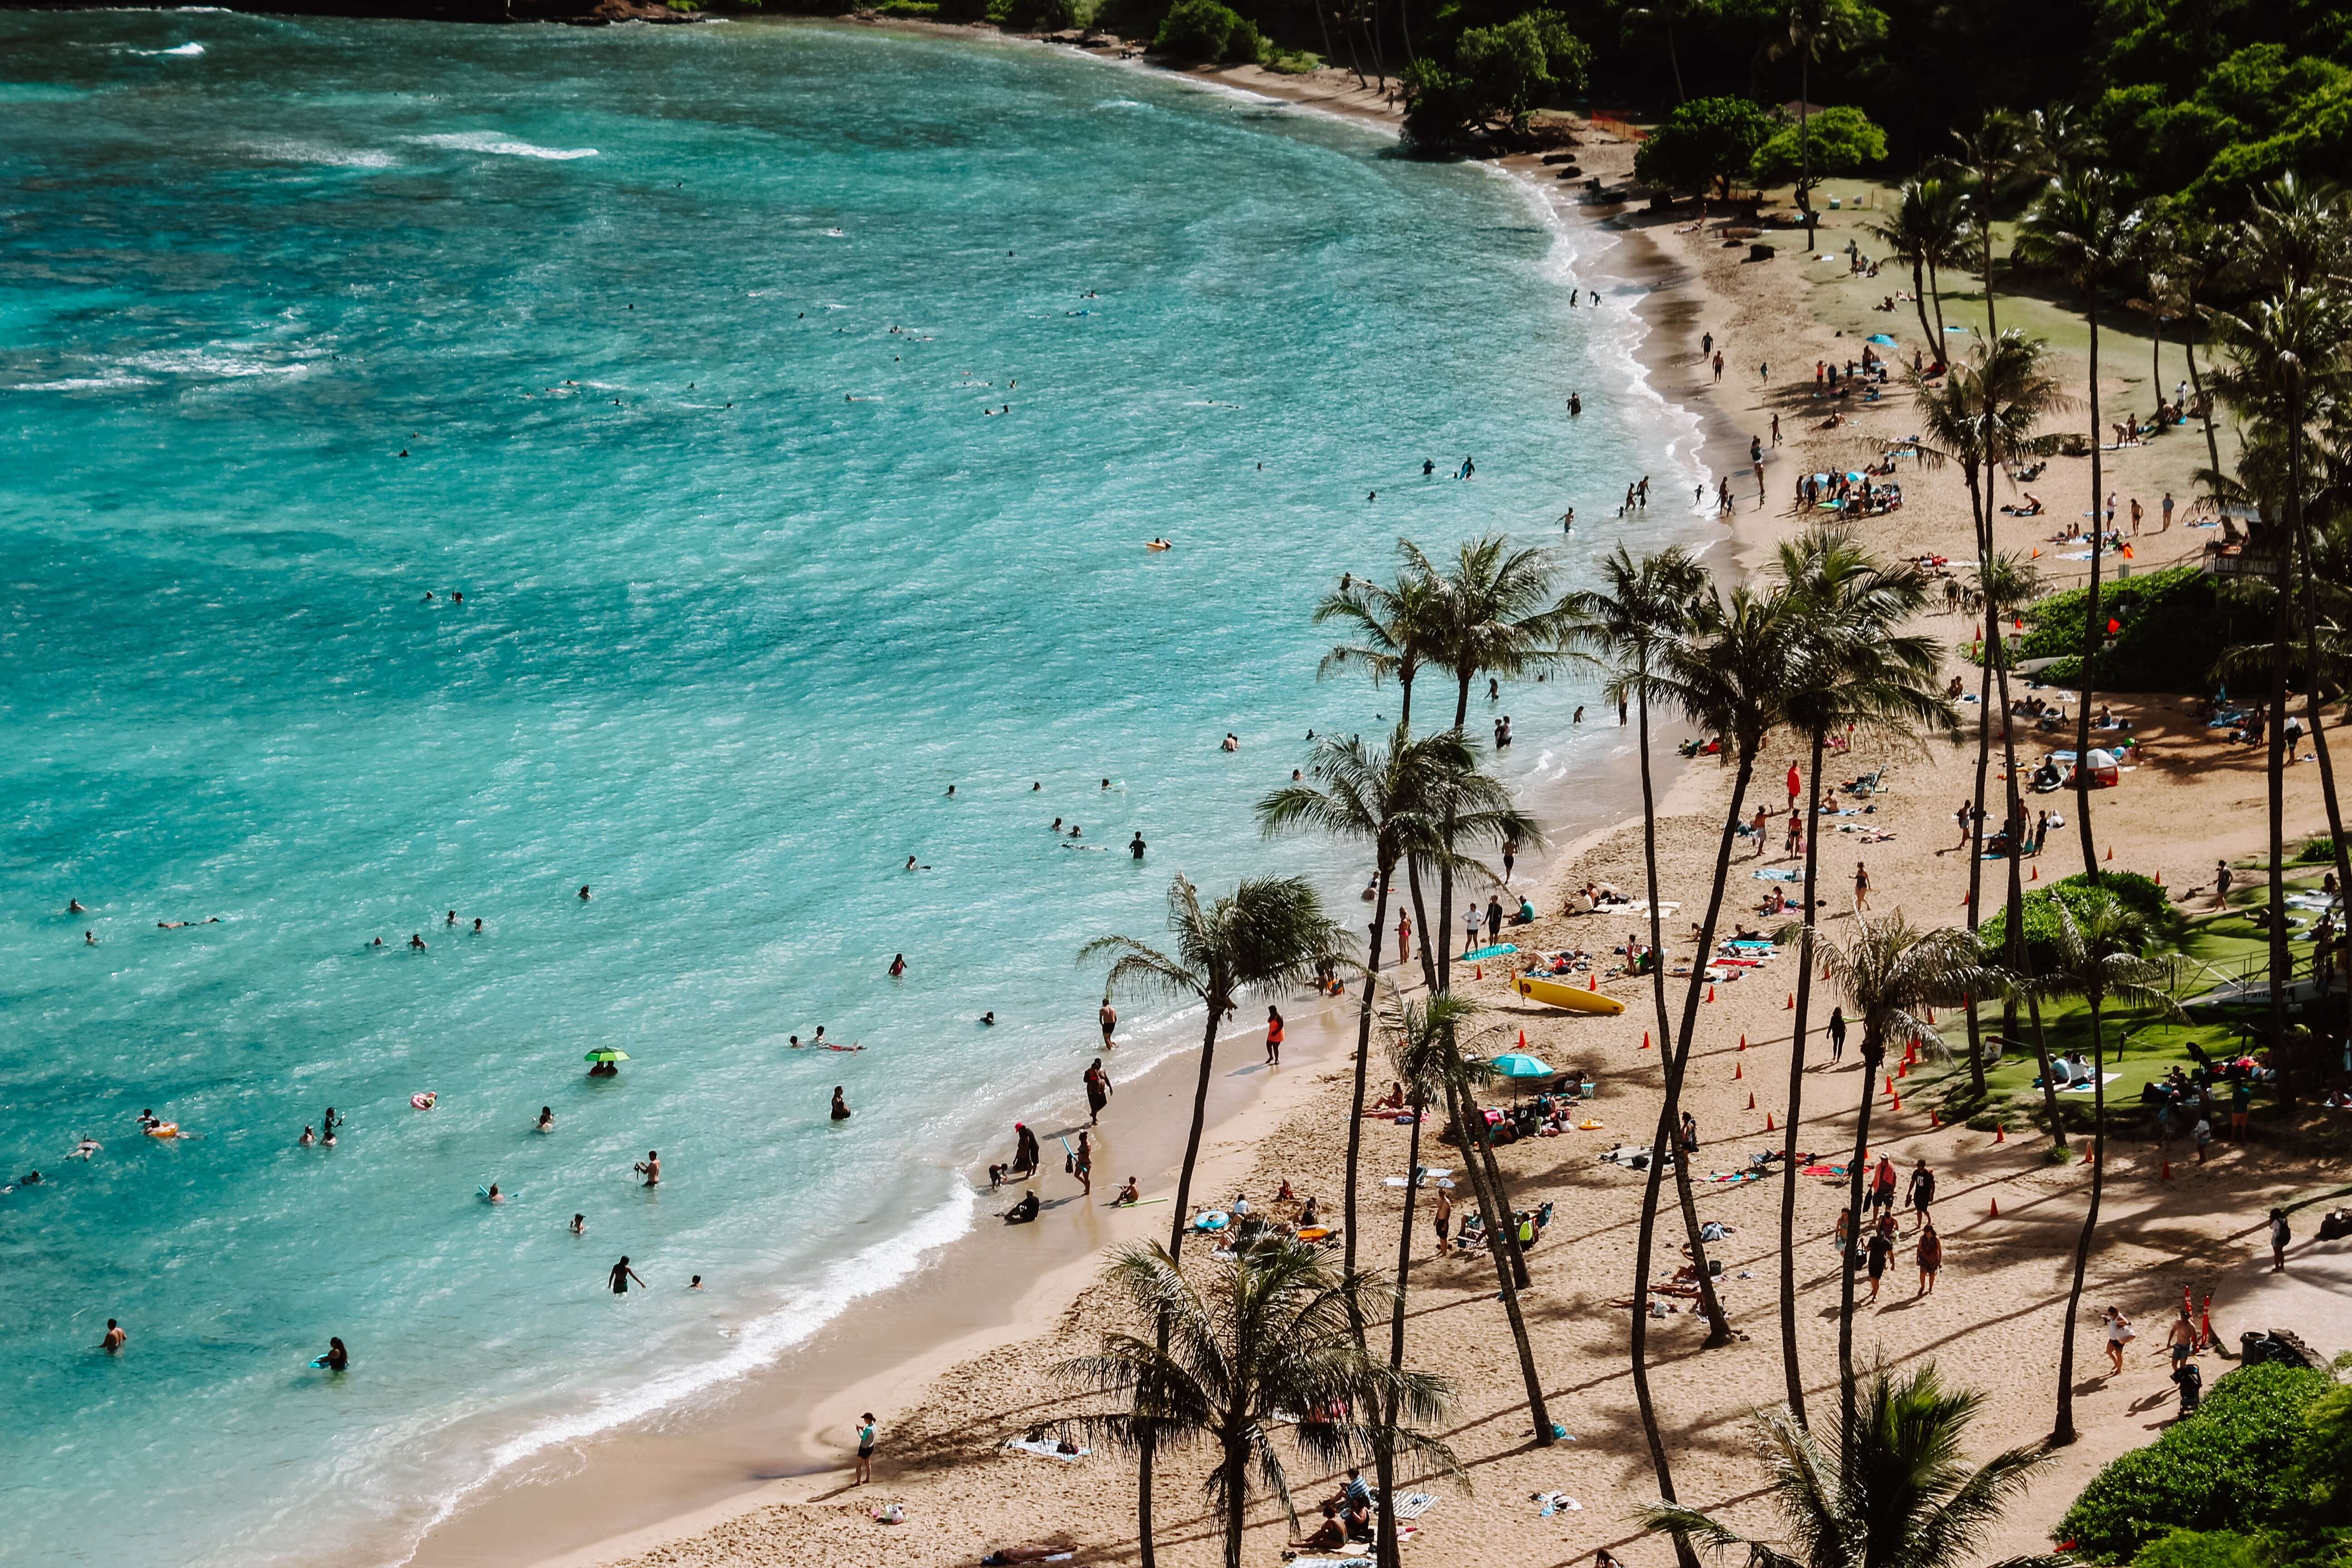 Toronto to Honolulu, Hawaii - $495 CAD roundtrip w/ United ...